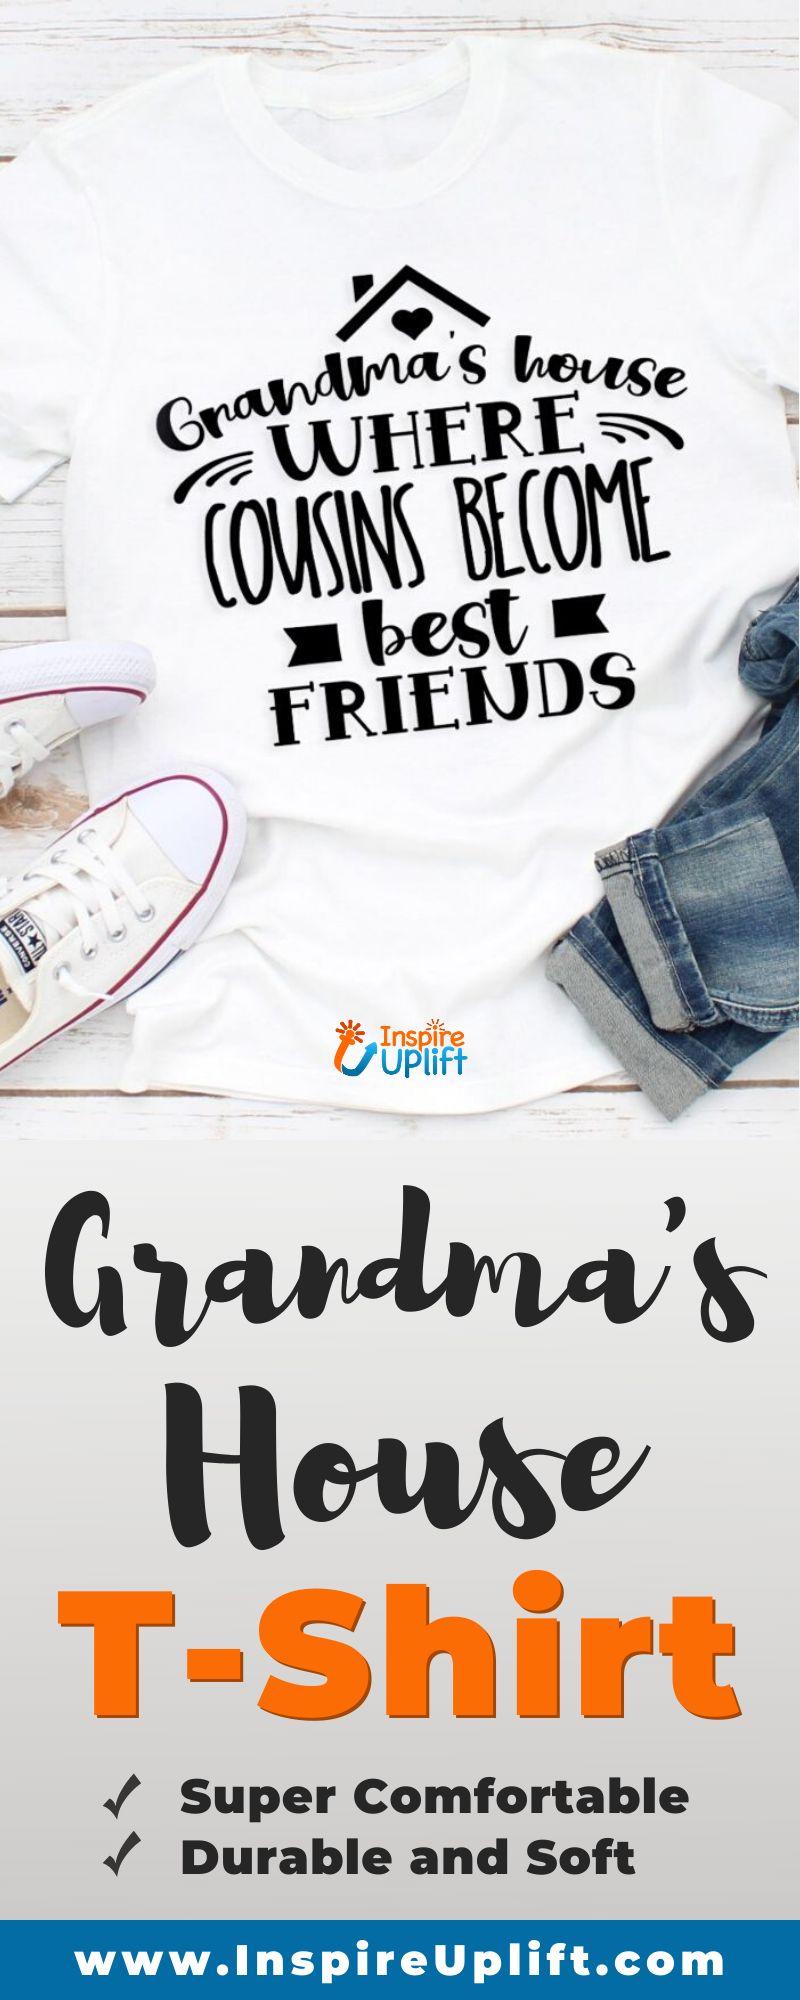 Grandma's House T-Shirt 😍 InspireUplift.com